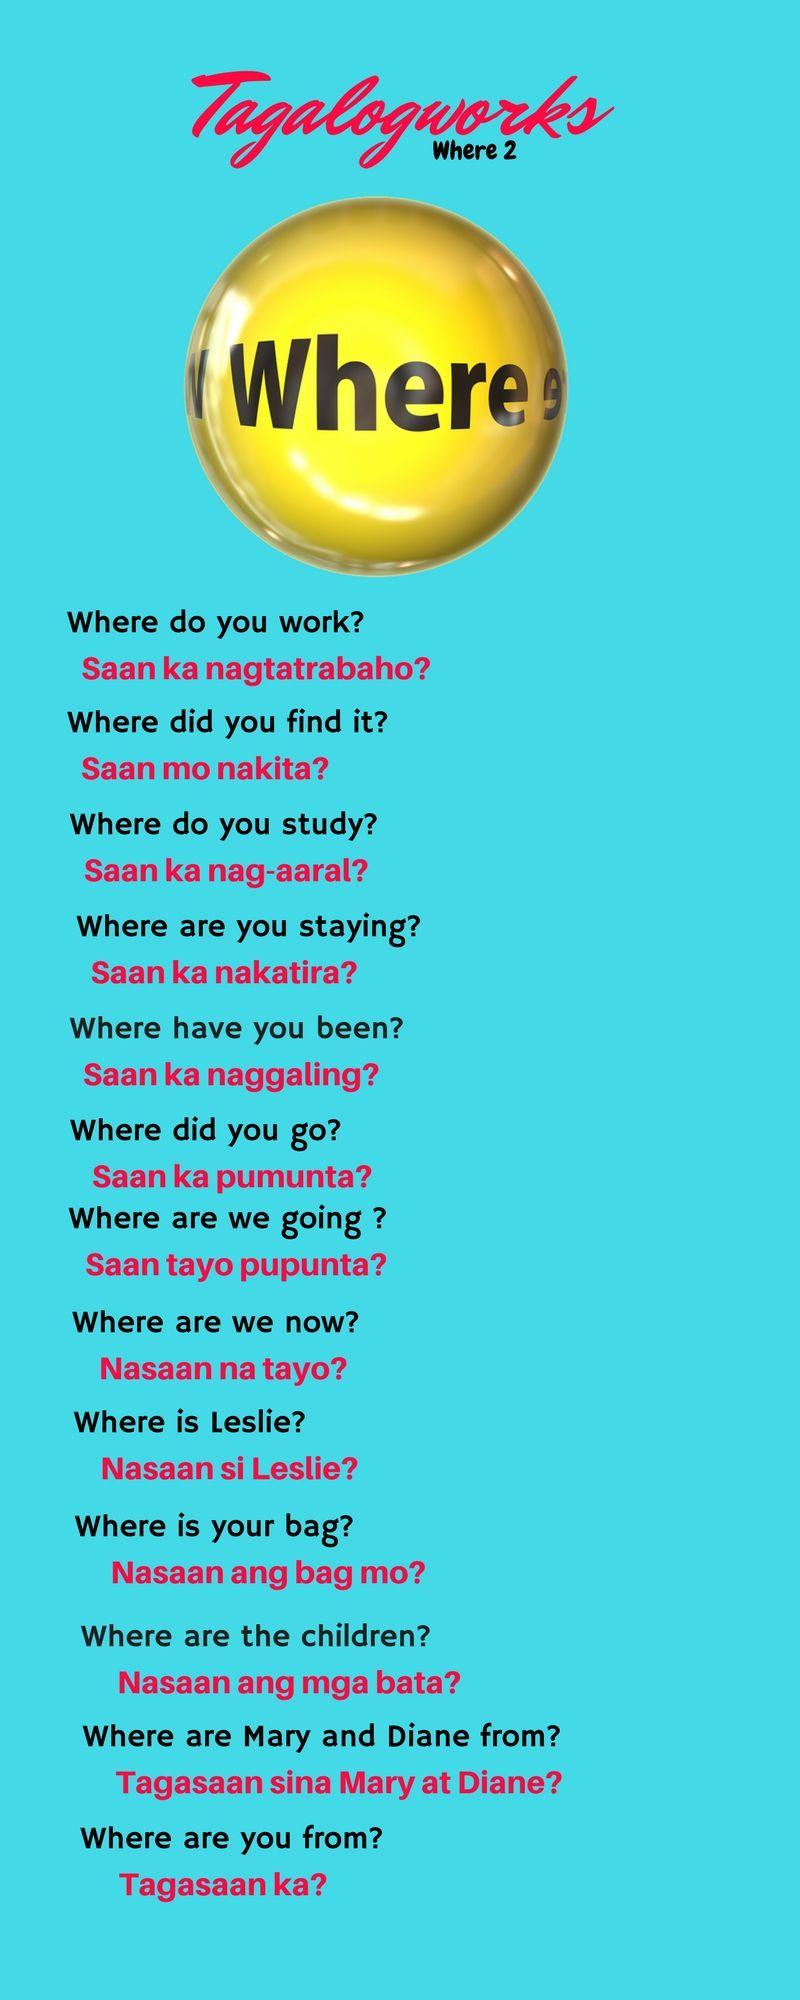 Pin by Josh Meier on Language Tagalog words, Tagalog